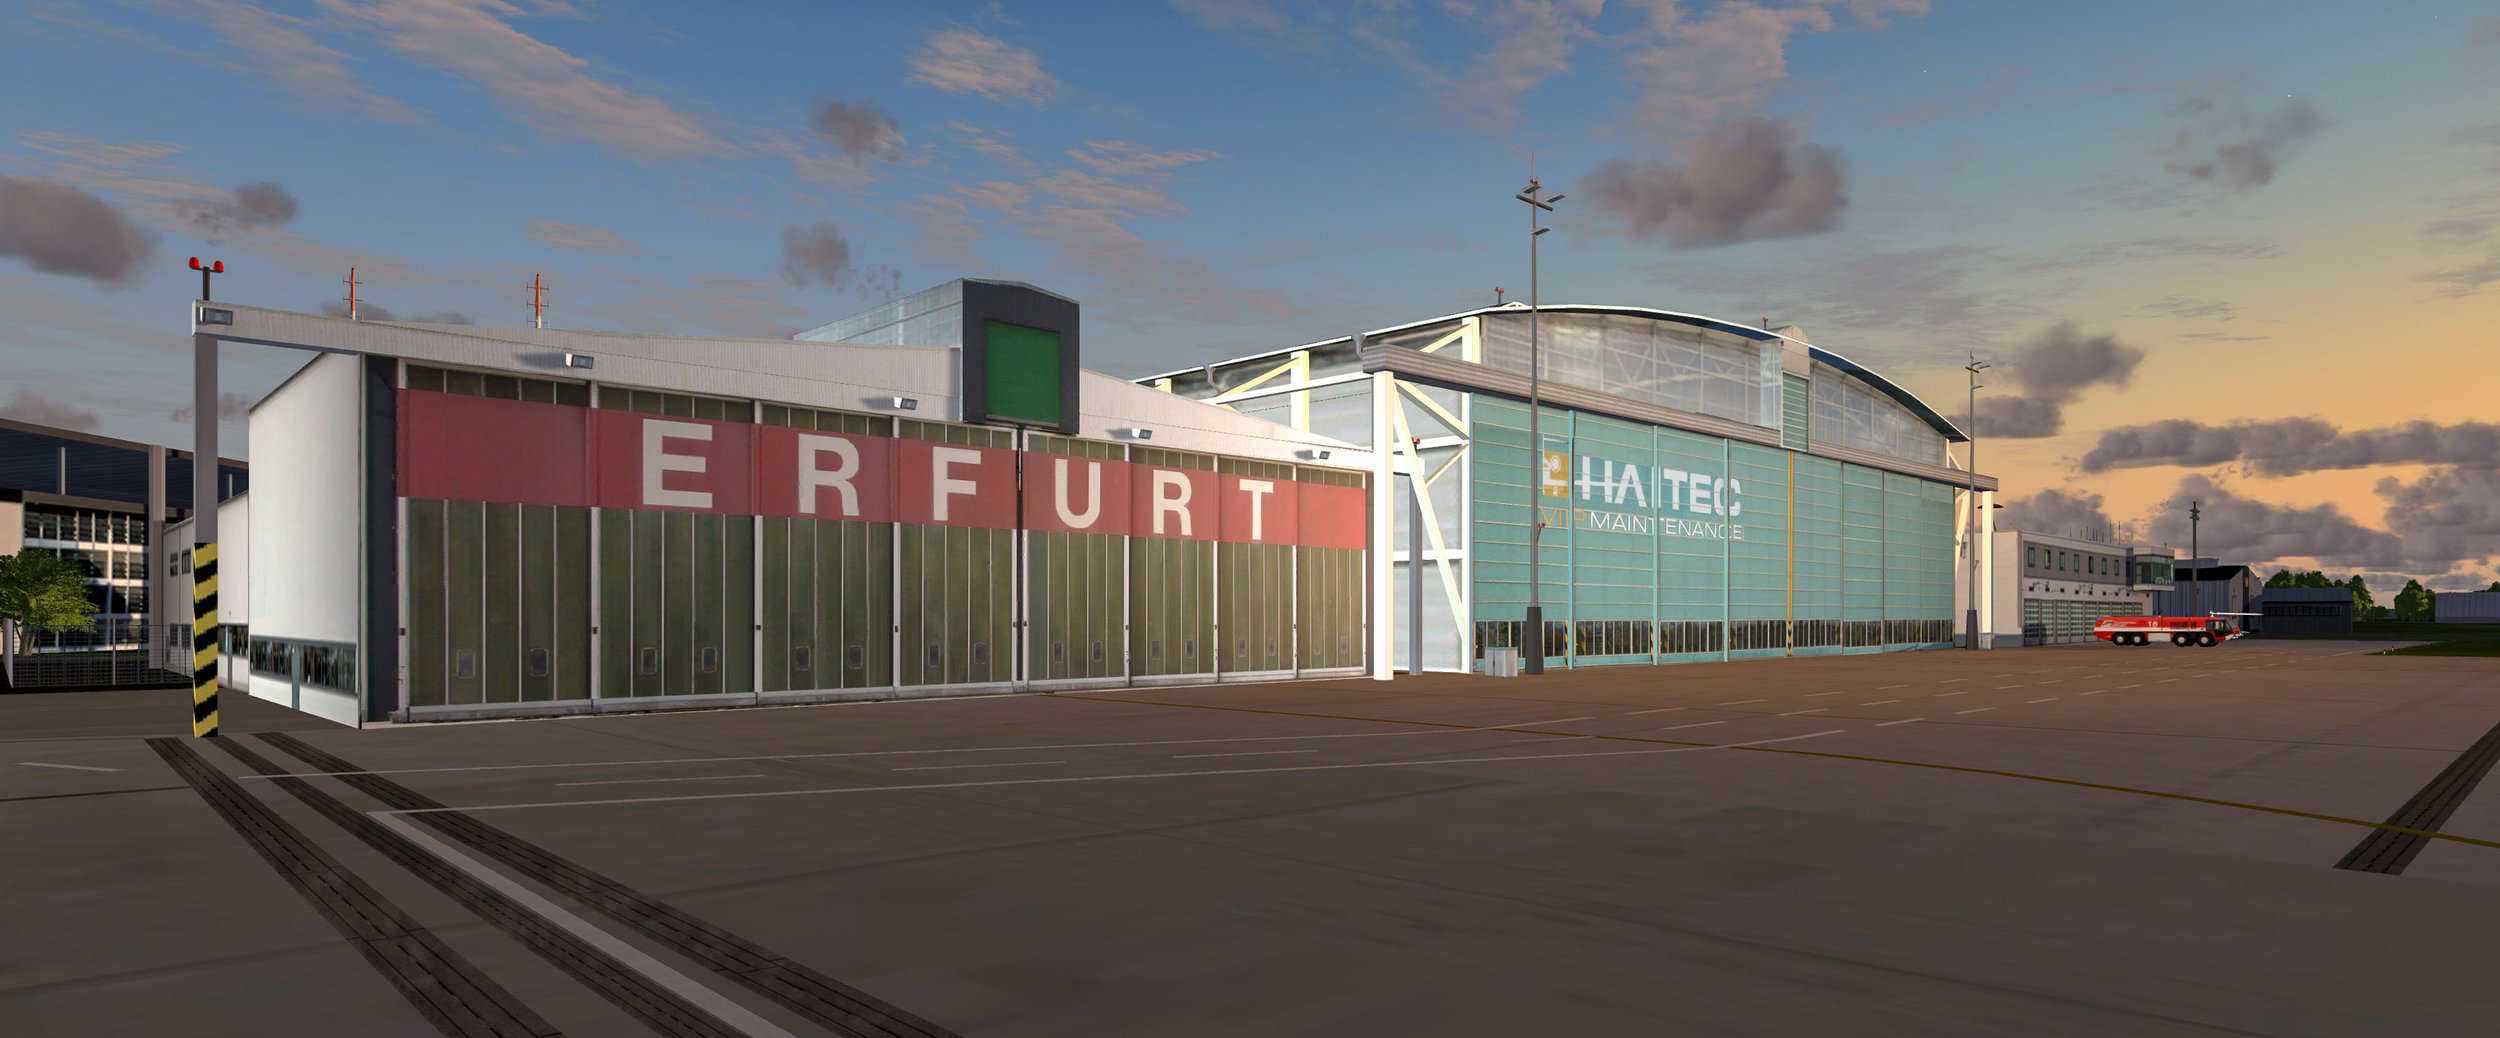 Airport_Erfurt_P3Dv4_18.jpg